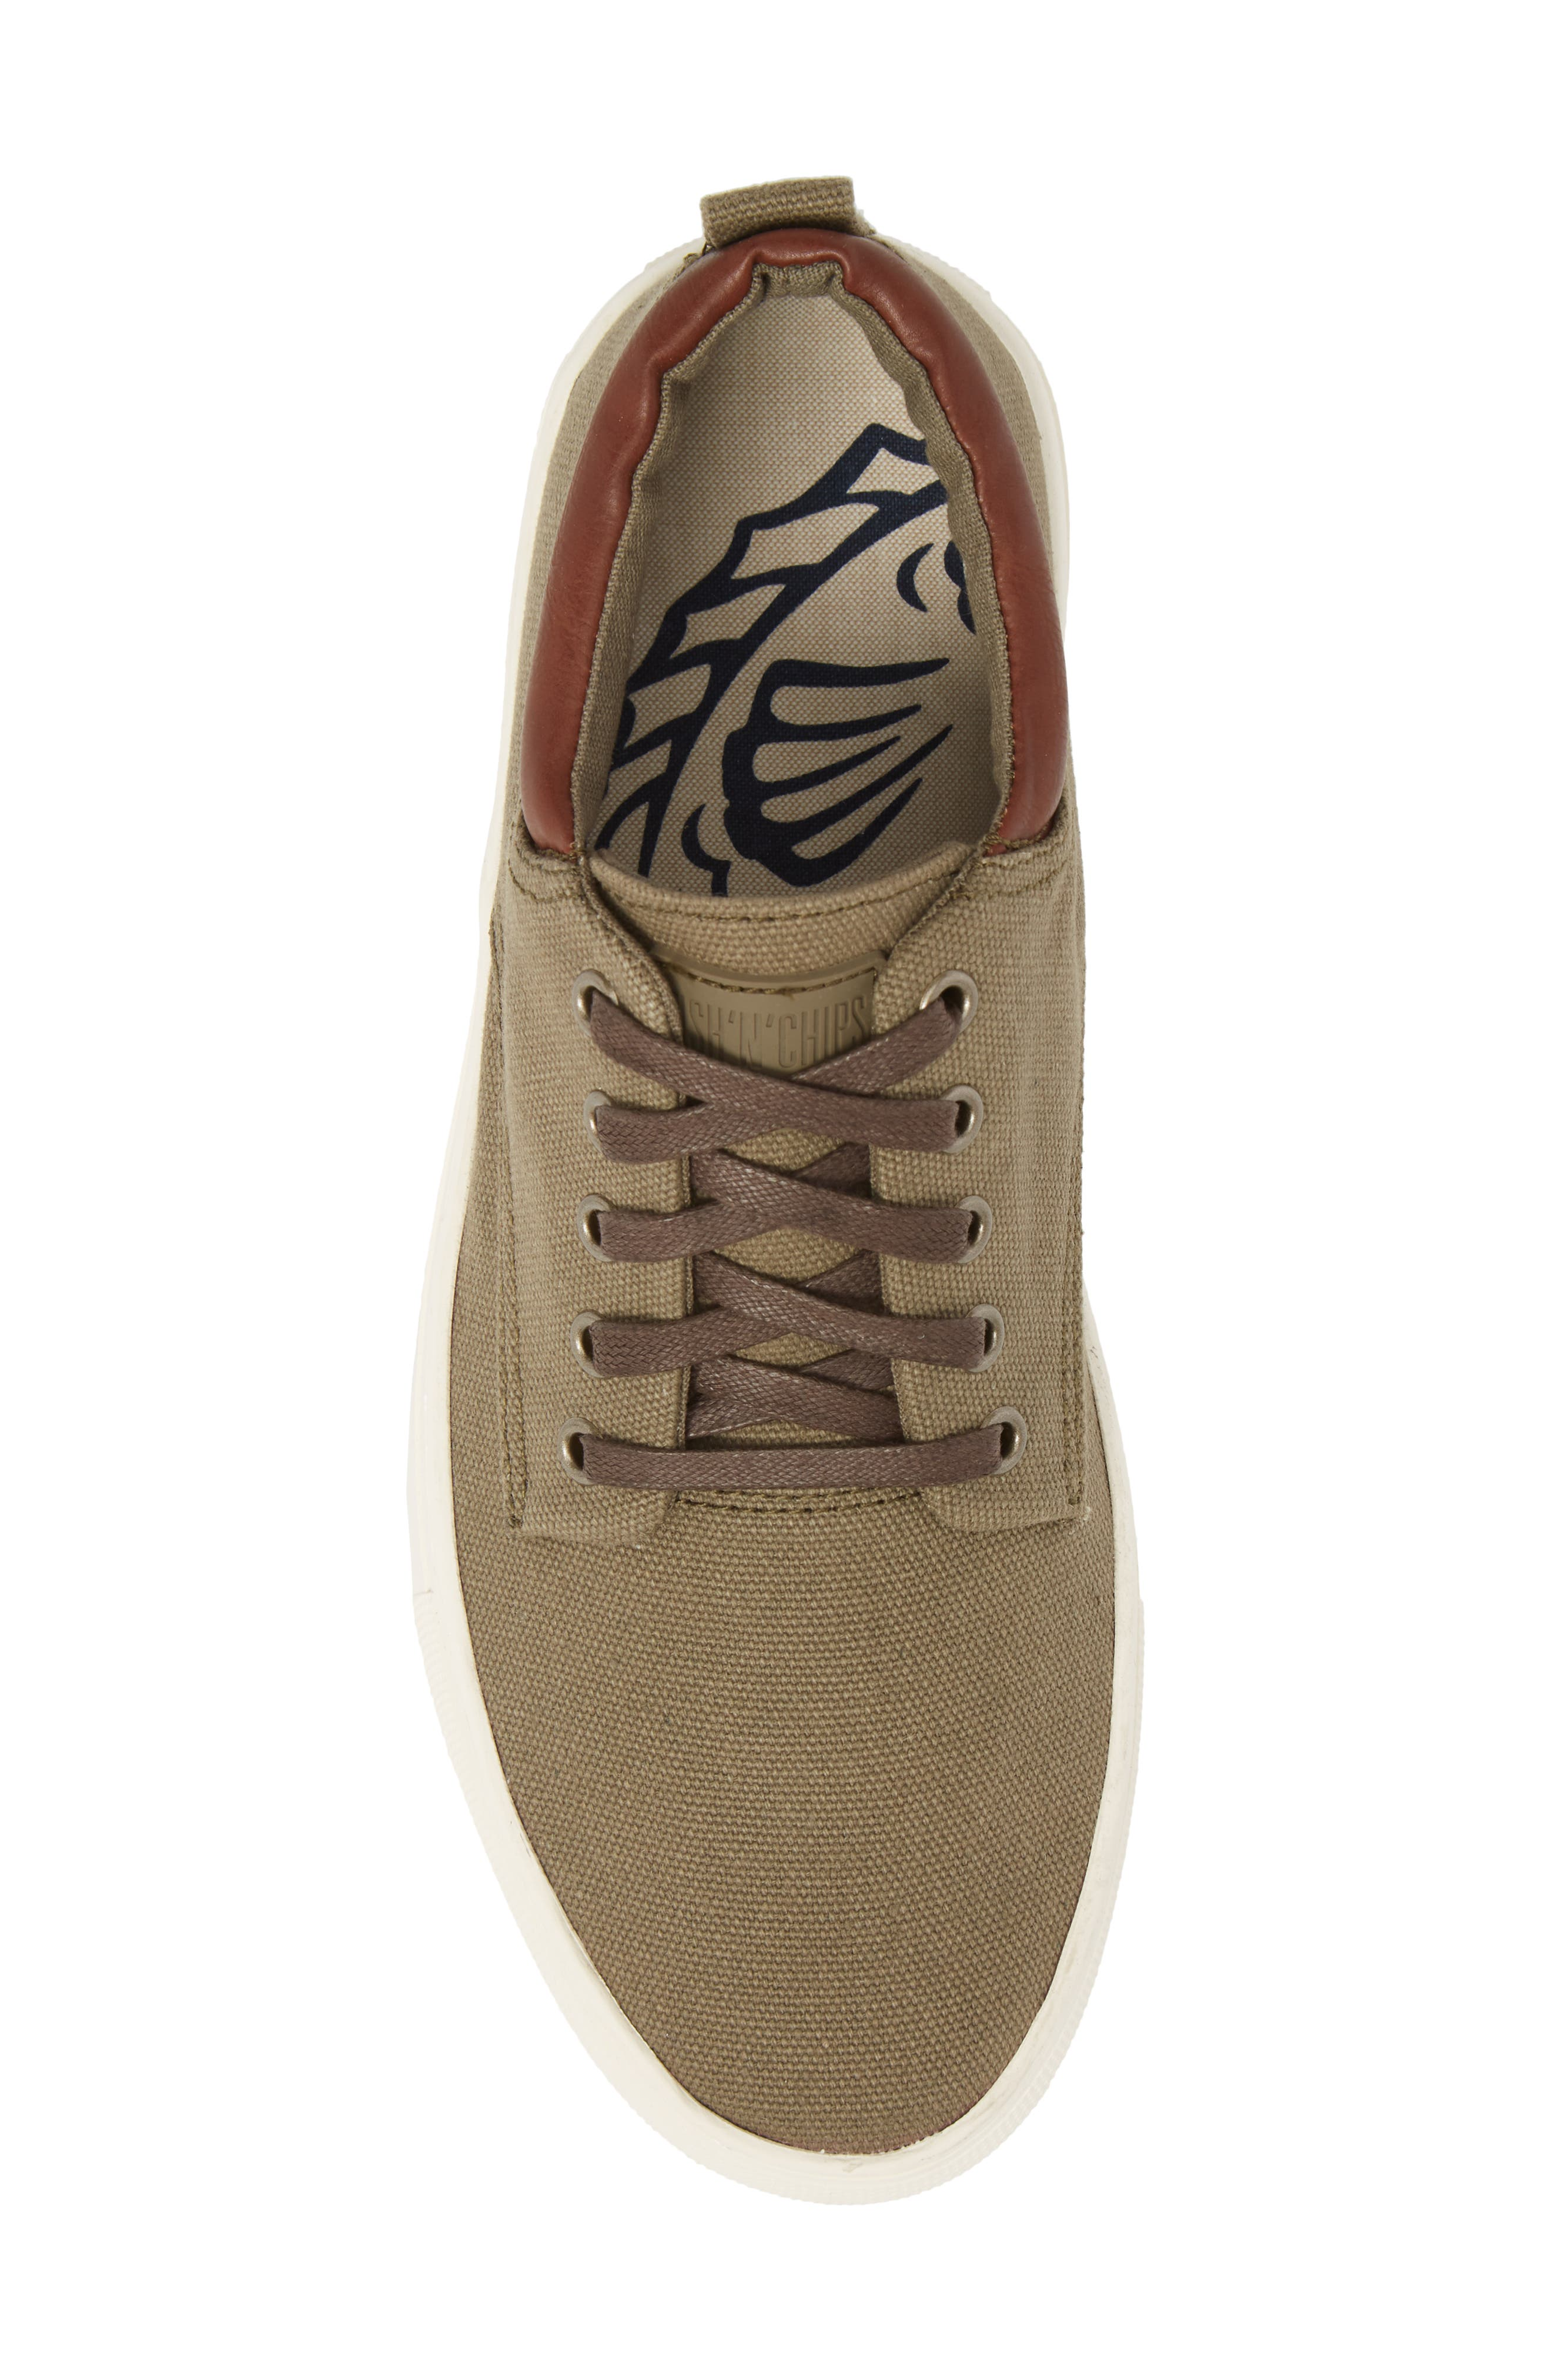 Fish 'N' Chips Hampton Low Top Sneaker,                             Alternate thumbnail 5, color,                             Olive Fabric